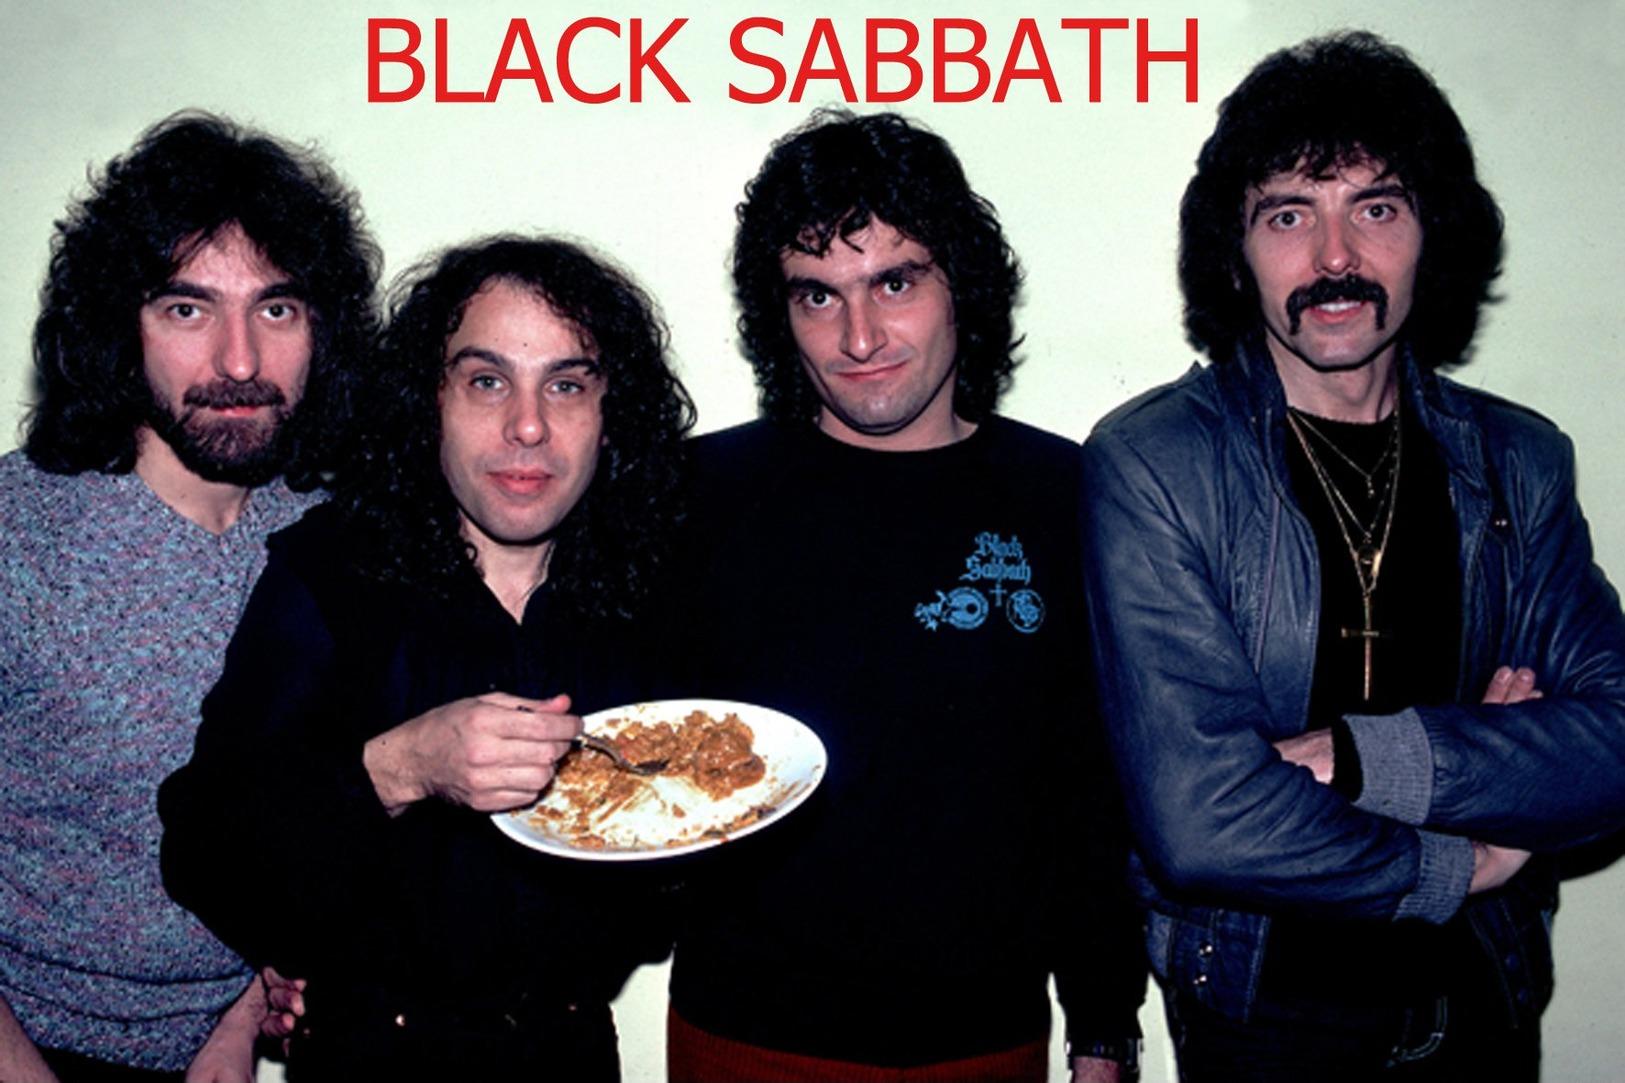 Black Sabbath Rock Band Original Postcard In Near Mint Condition. 013 - Postcards